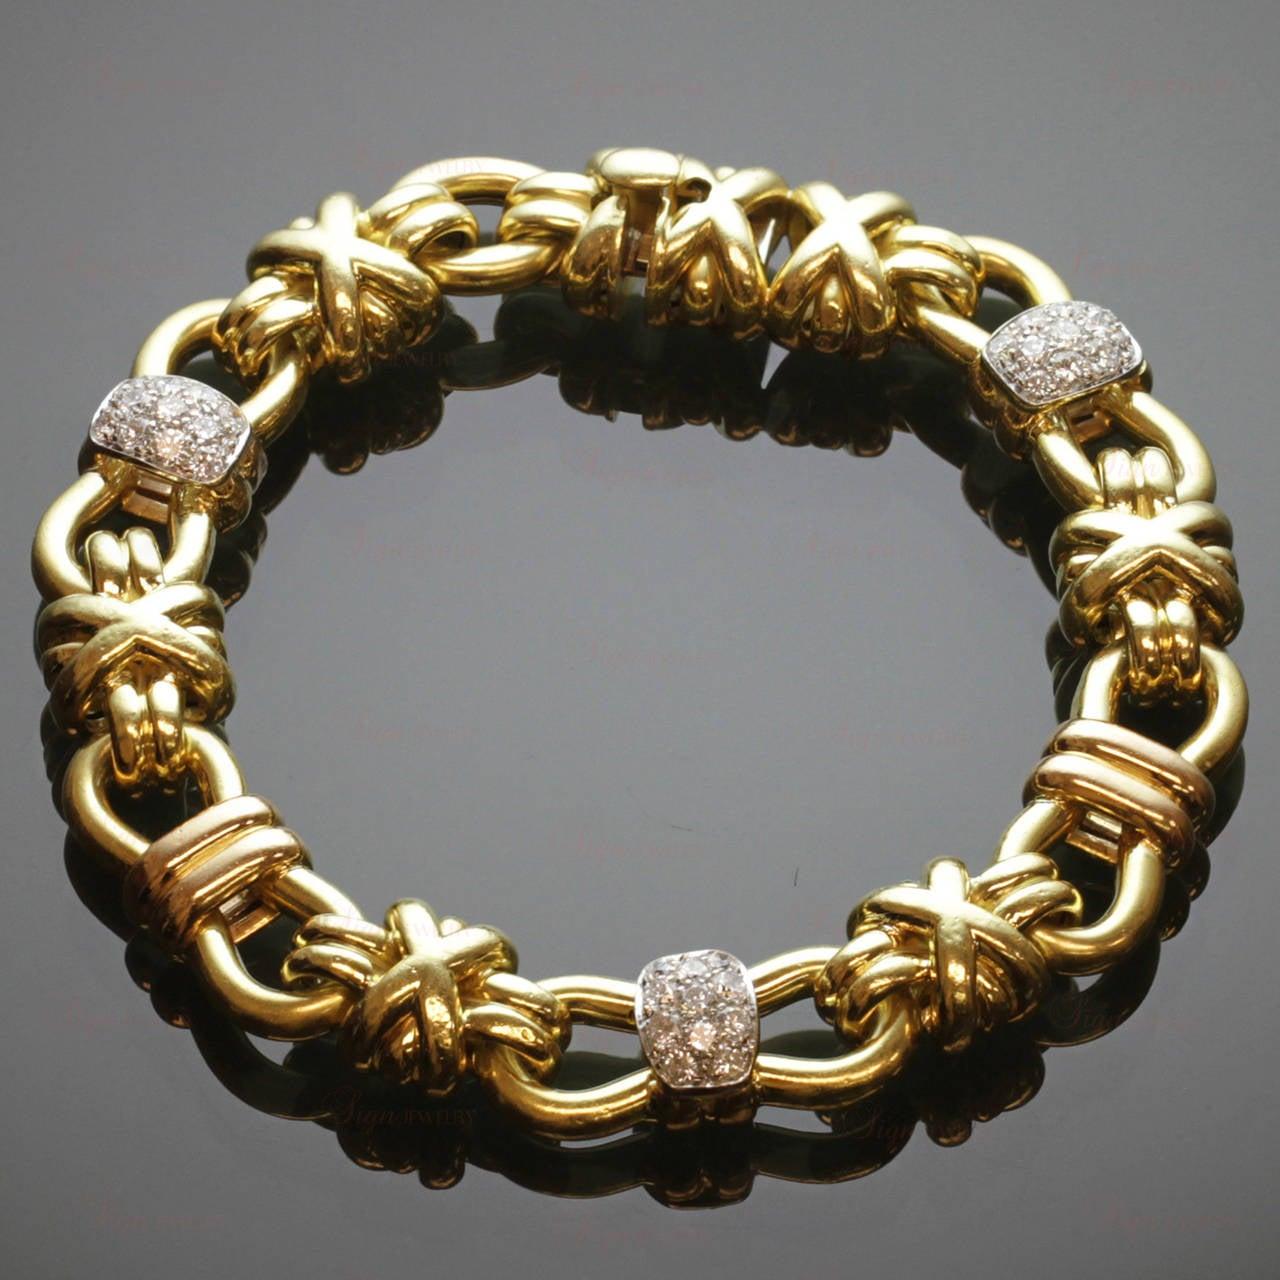 Gold Italy Platinum: 1980s Italian Diamond Gold Link Bracelet For Sale At 1stdibs